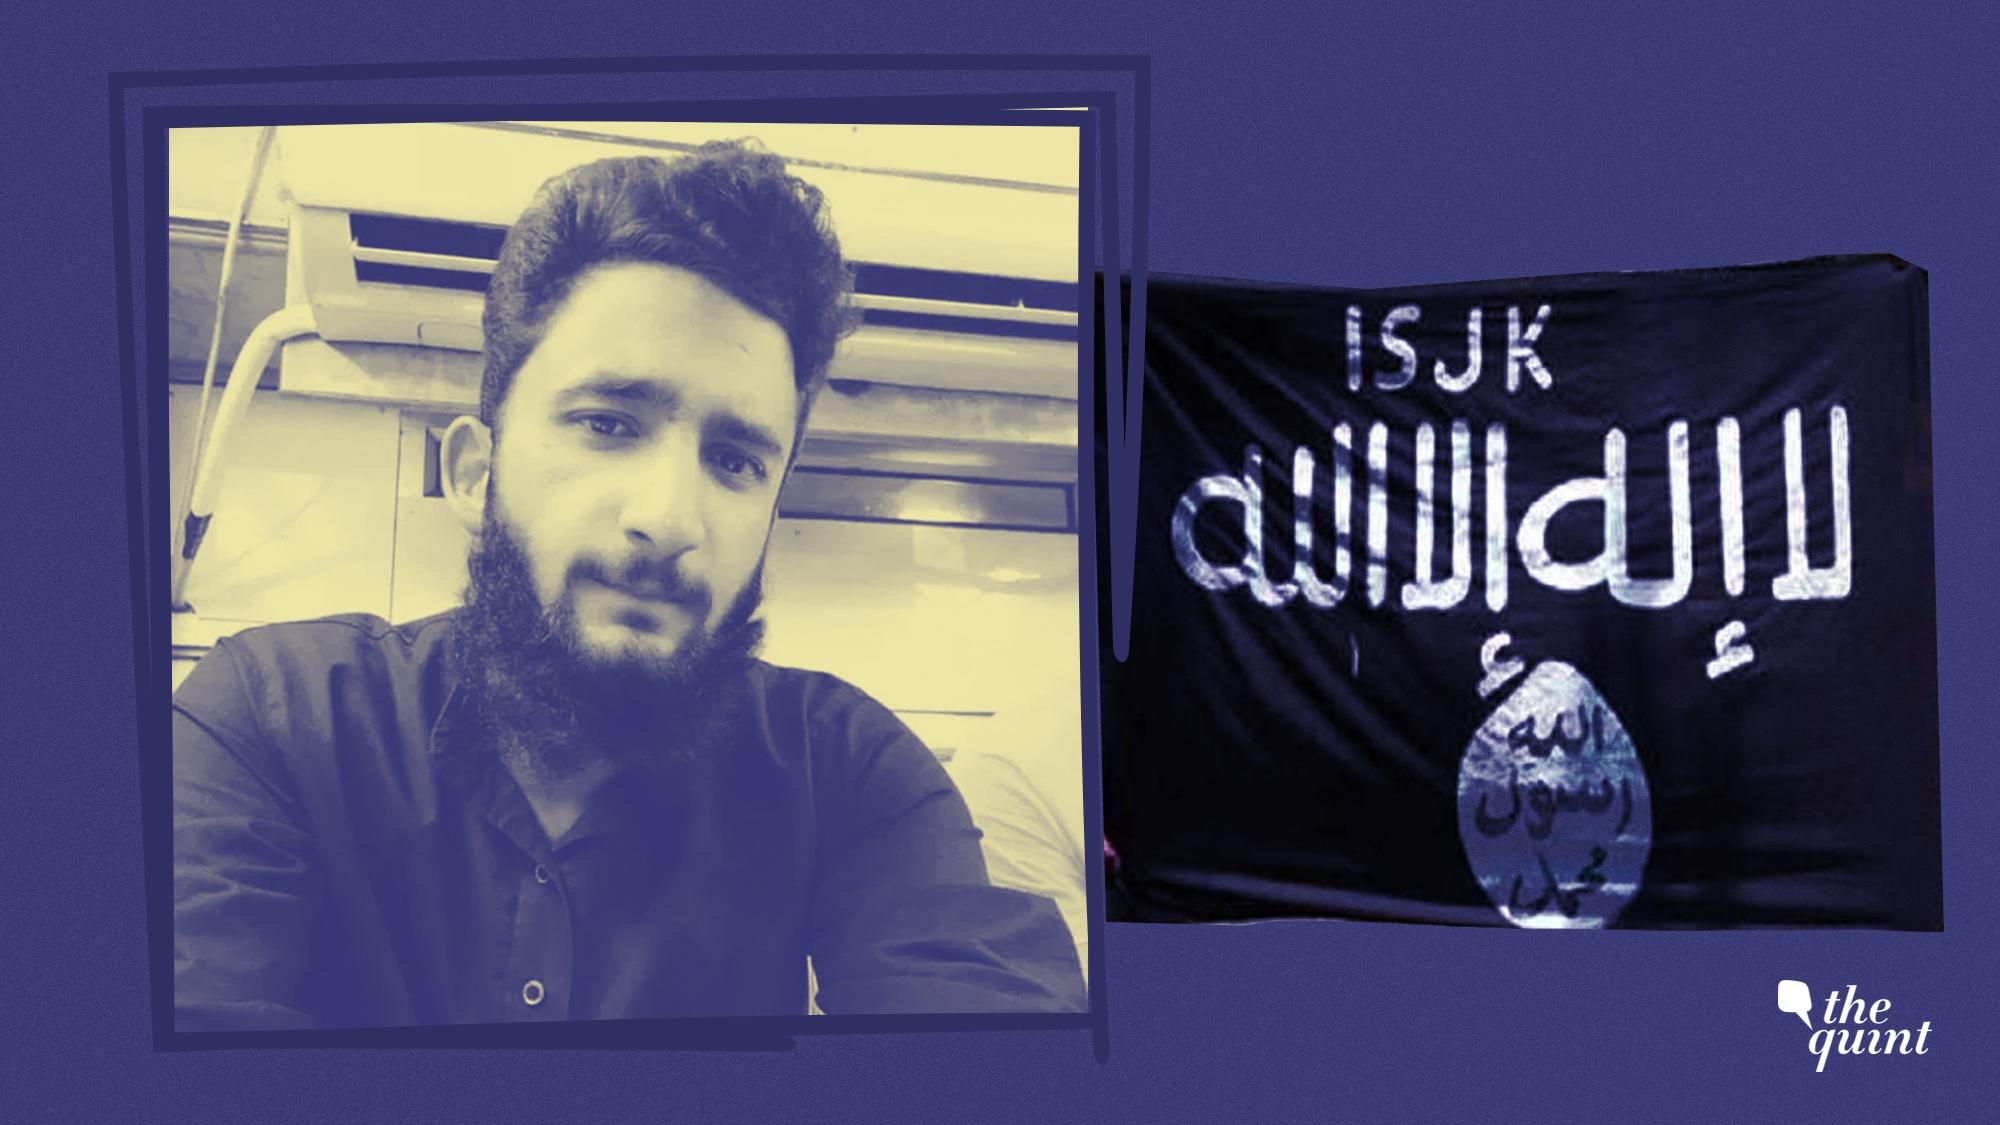 Sharda Uni Student Joins ISJK, Threatens Caliphate in Kashmir